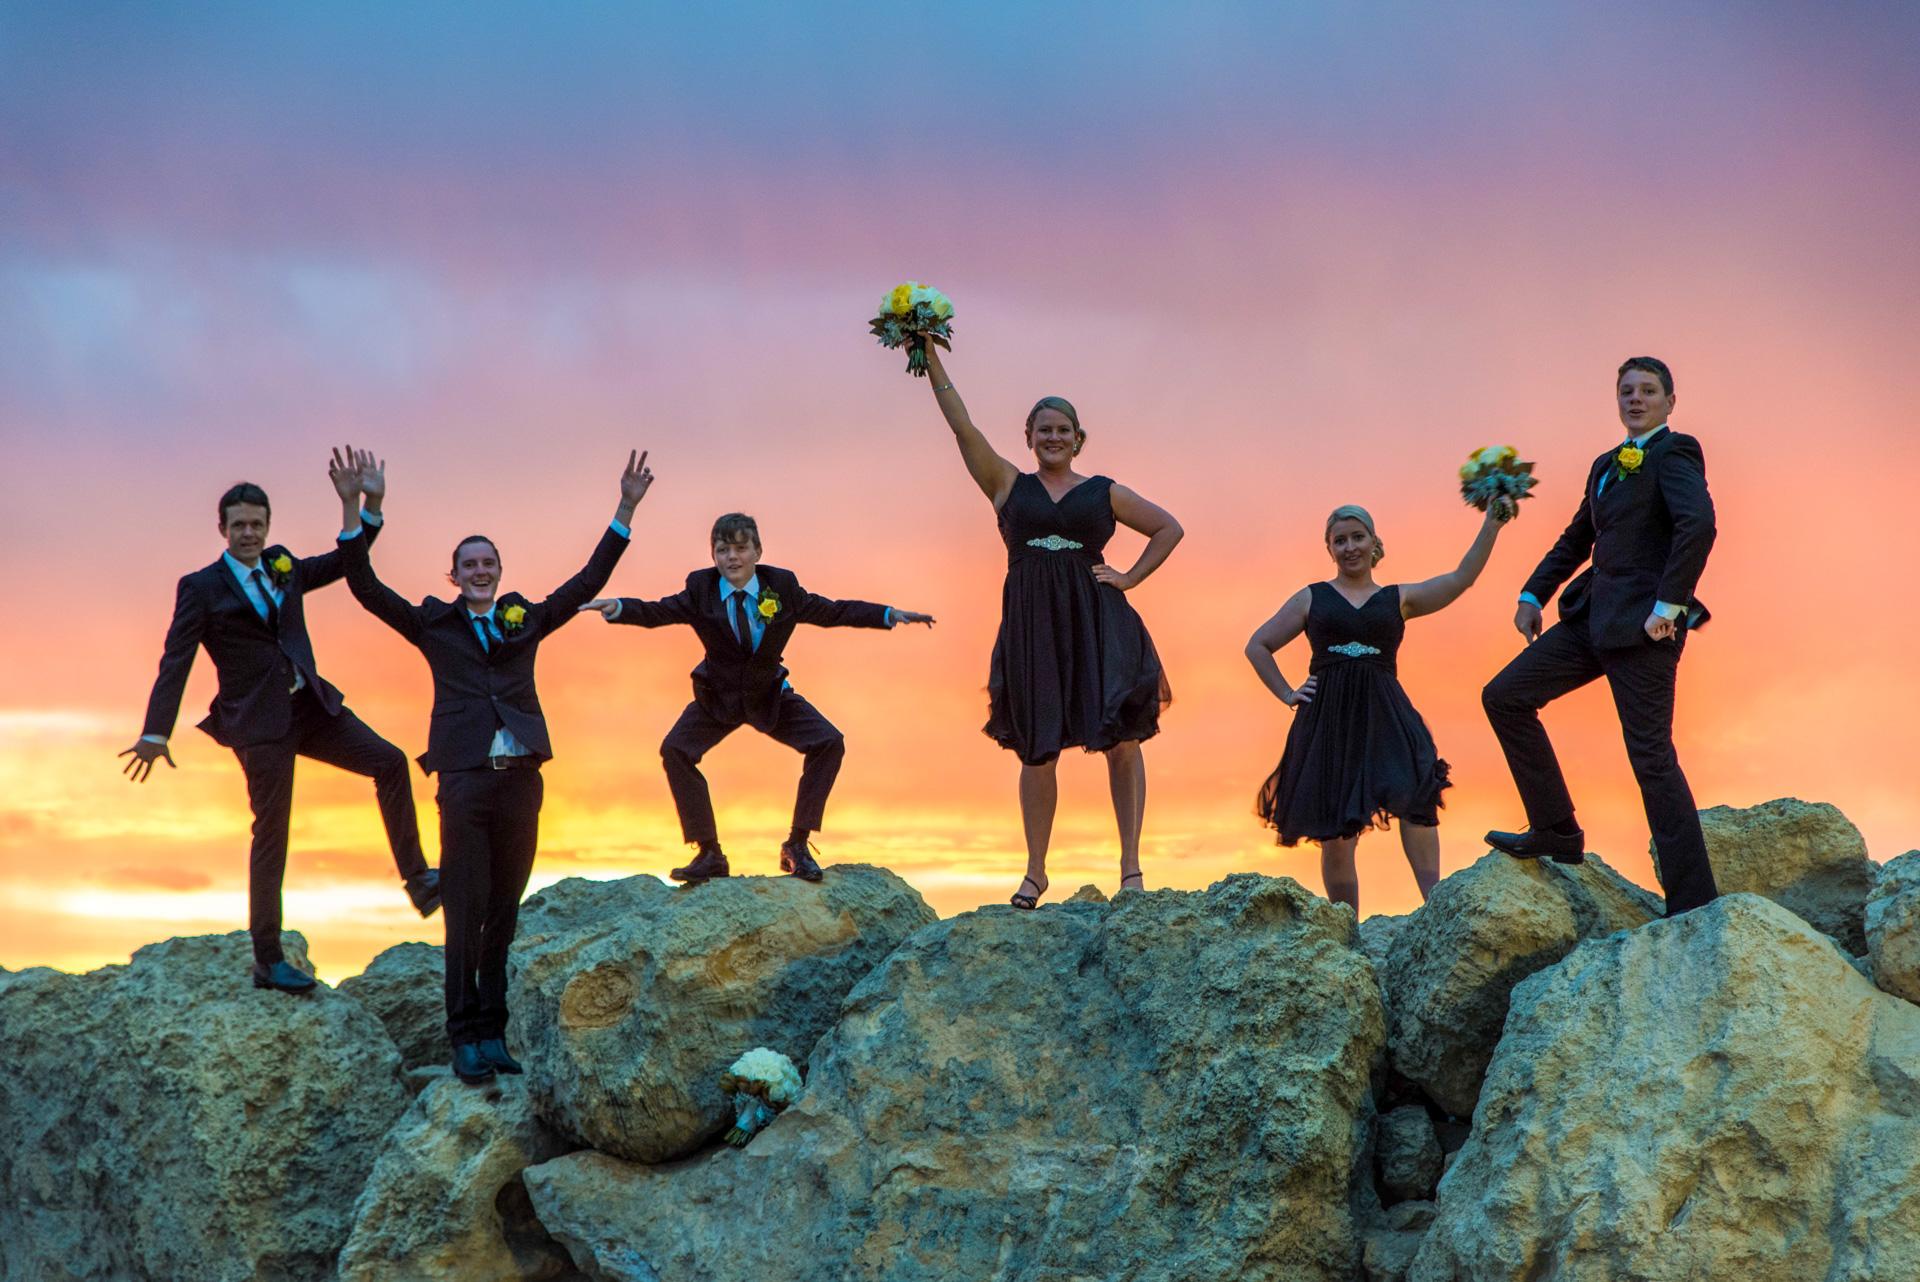 Fun Wedding Photo at Hillarys Reef